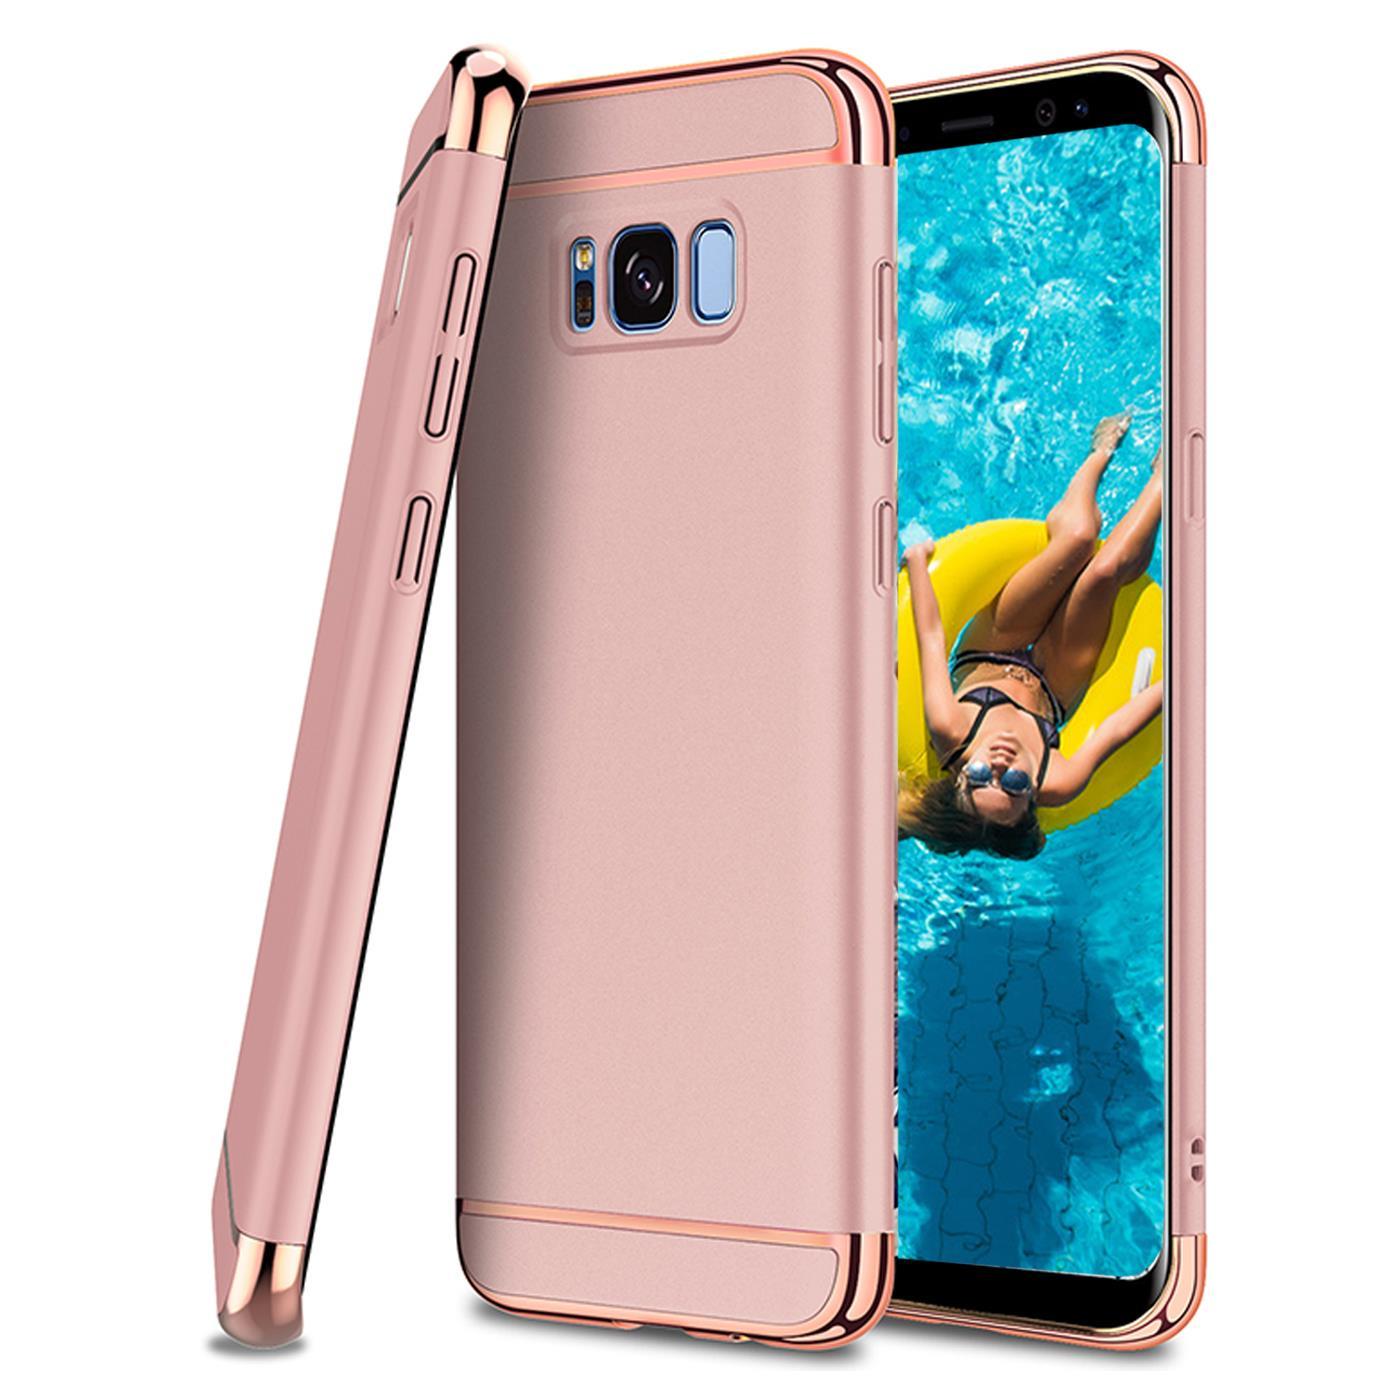 Samsung-Galaxy-S8-Hard-Back-Case-Cover-Thin-Bumper-Slim-Shockproof-Rugged-Thin thumbnail 4